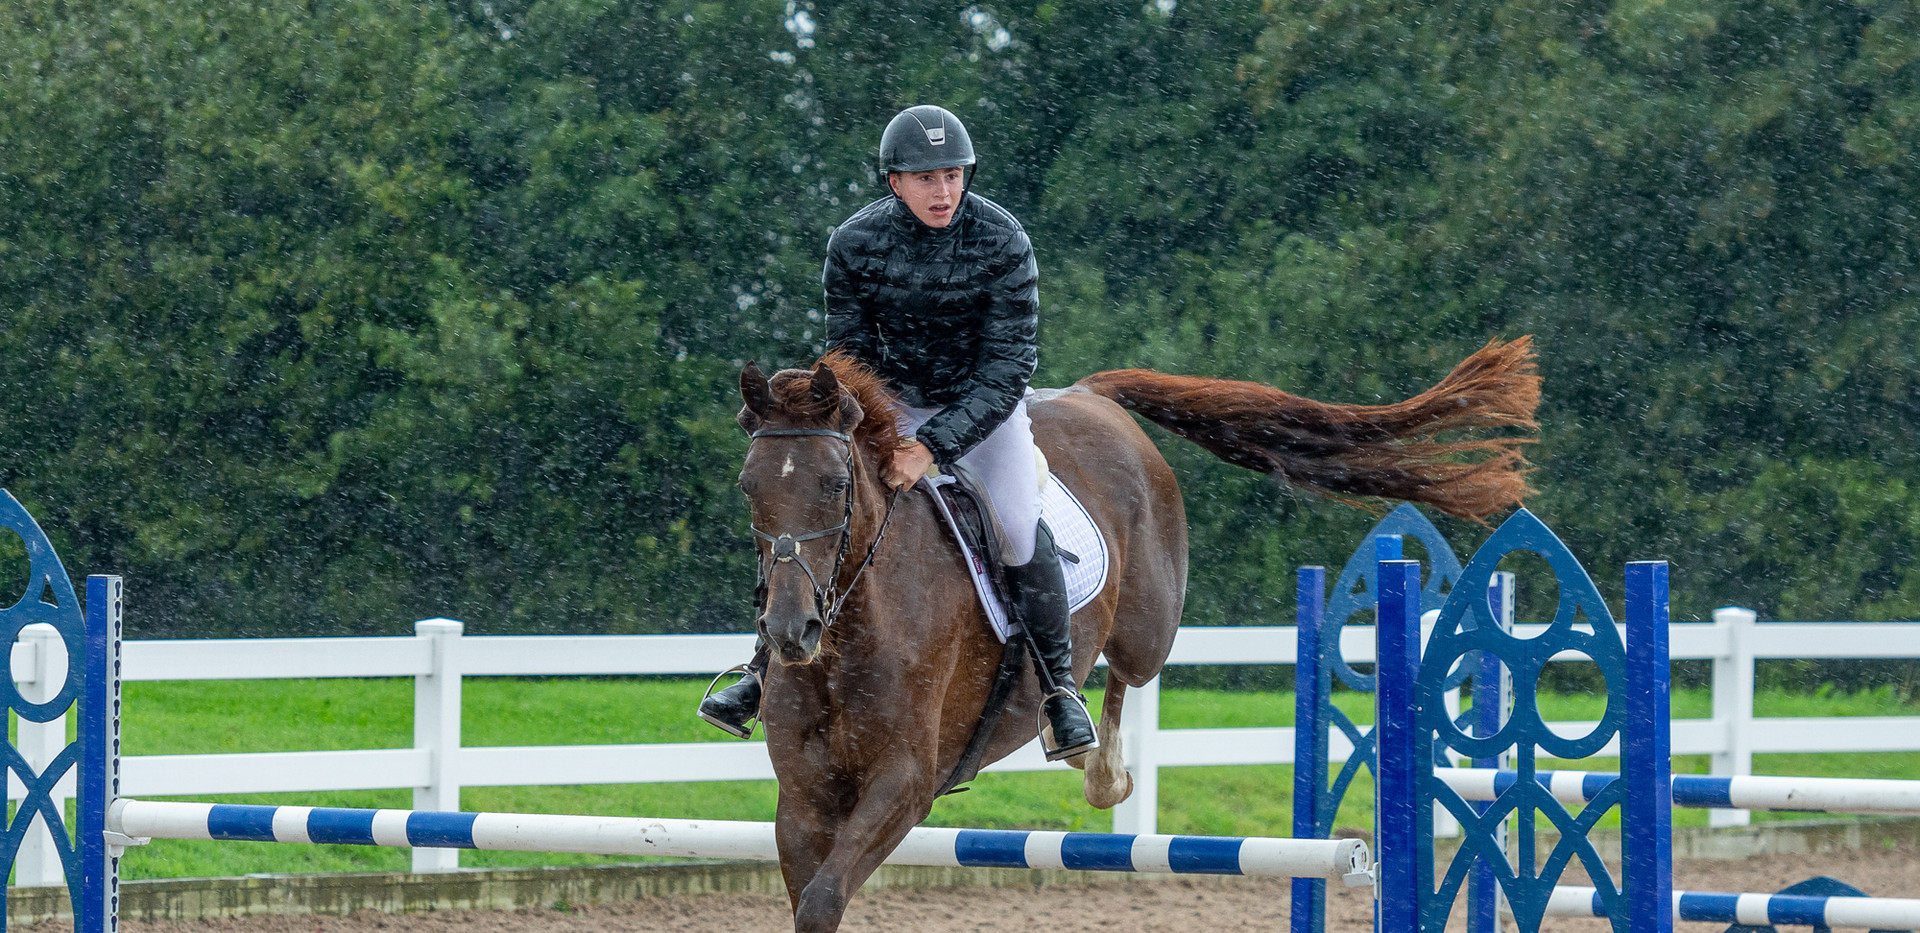 Tantoni Renaissance Chard Equestrian